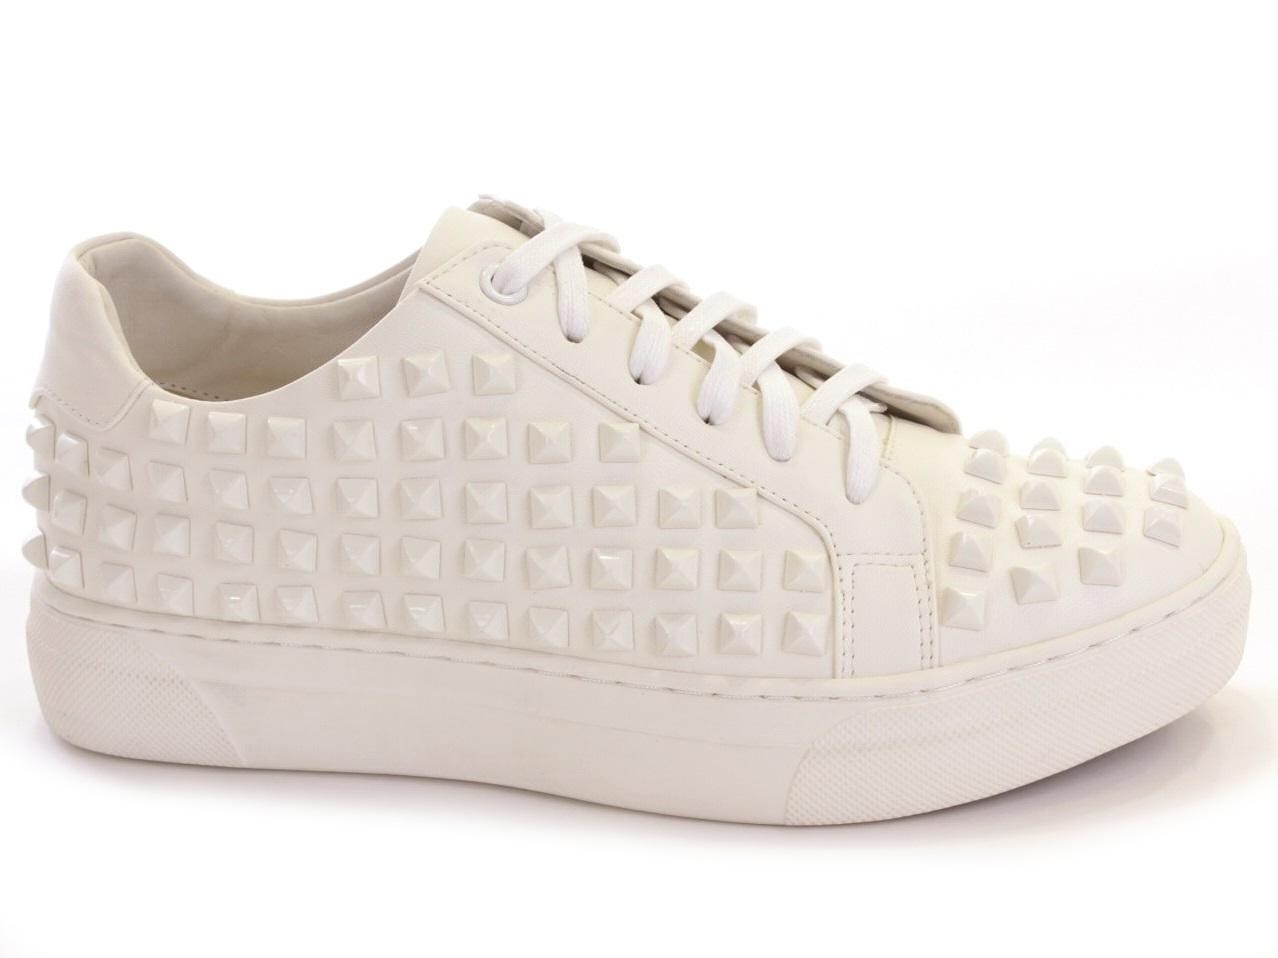 Sneakers and Espadrilles Uma Parker - 656 7030 2PU